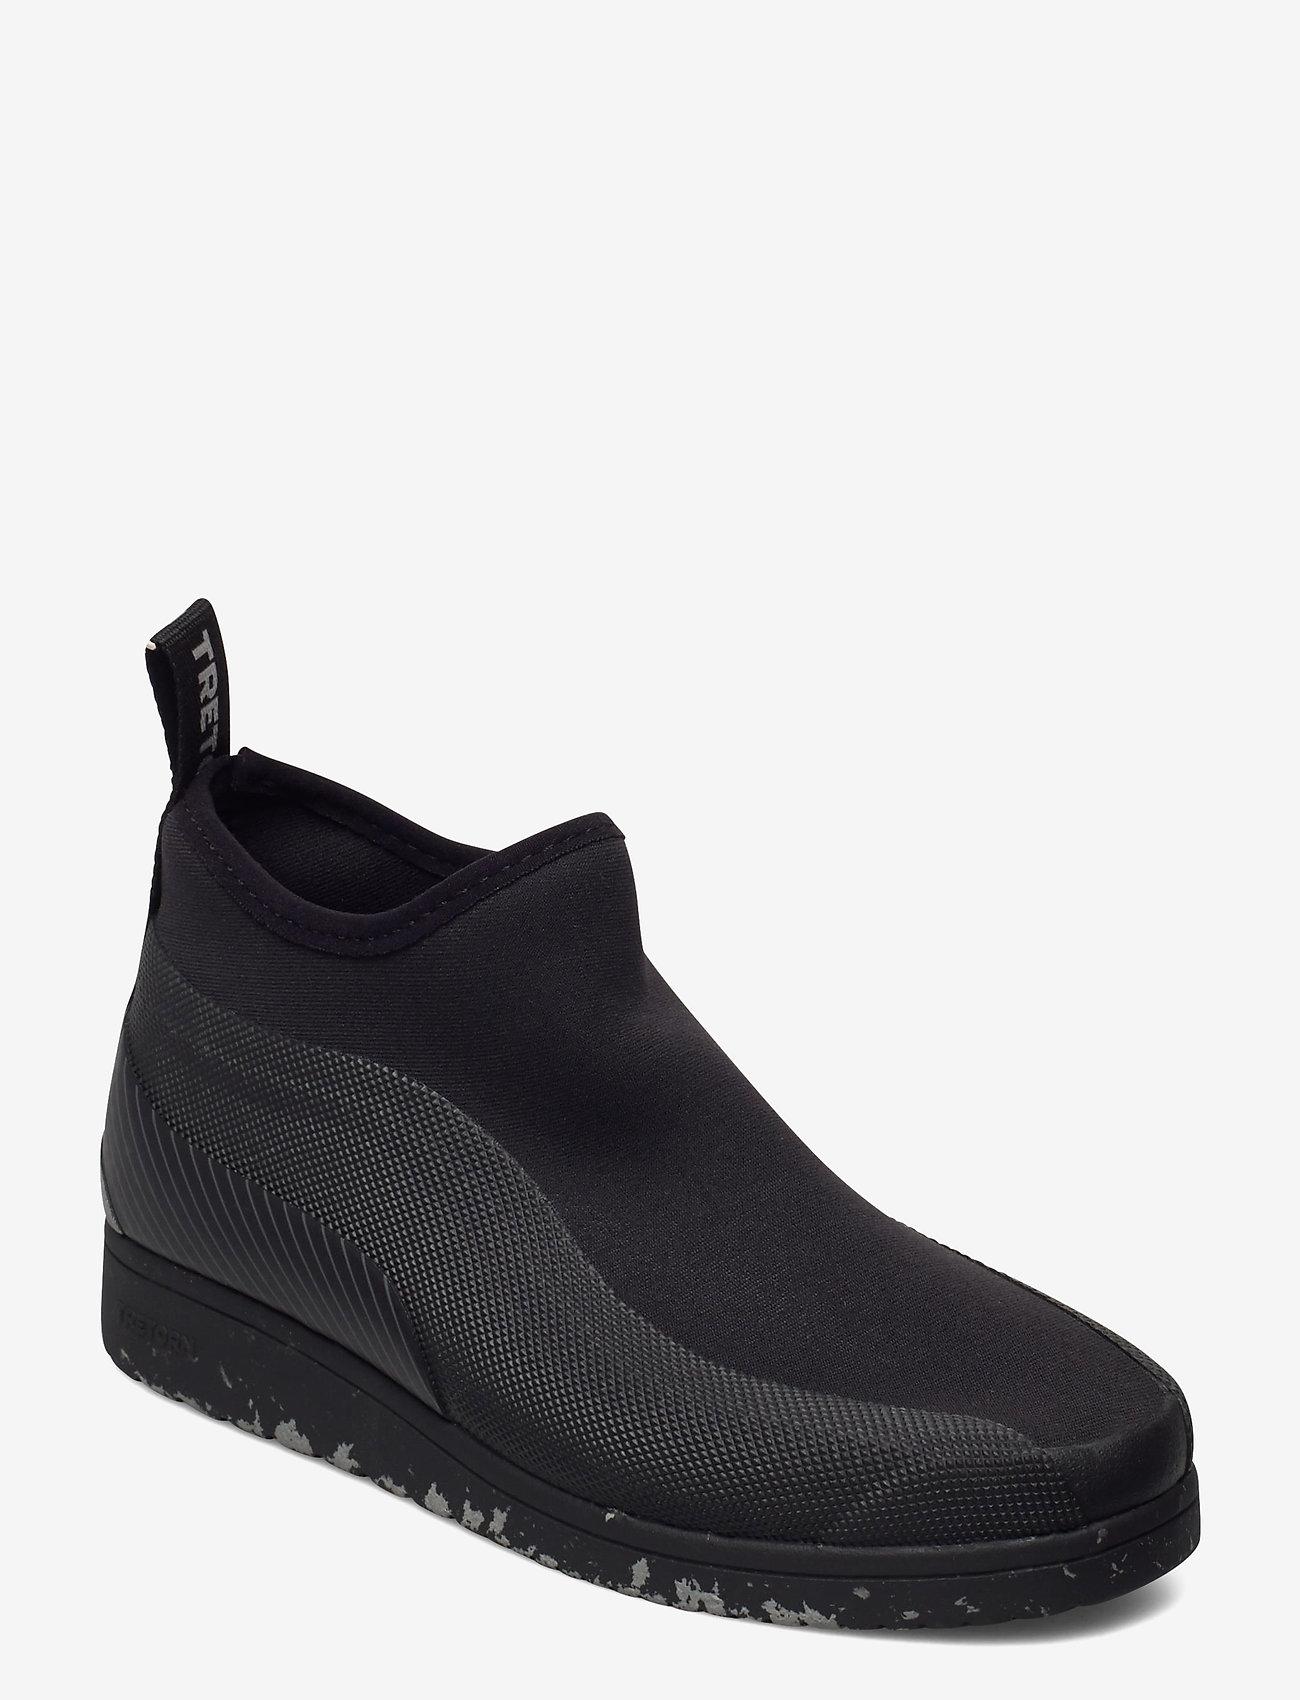 Tretorn - STELLAR HYBRID - höga sneakers - 010/black - 0